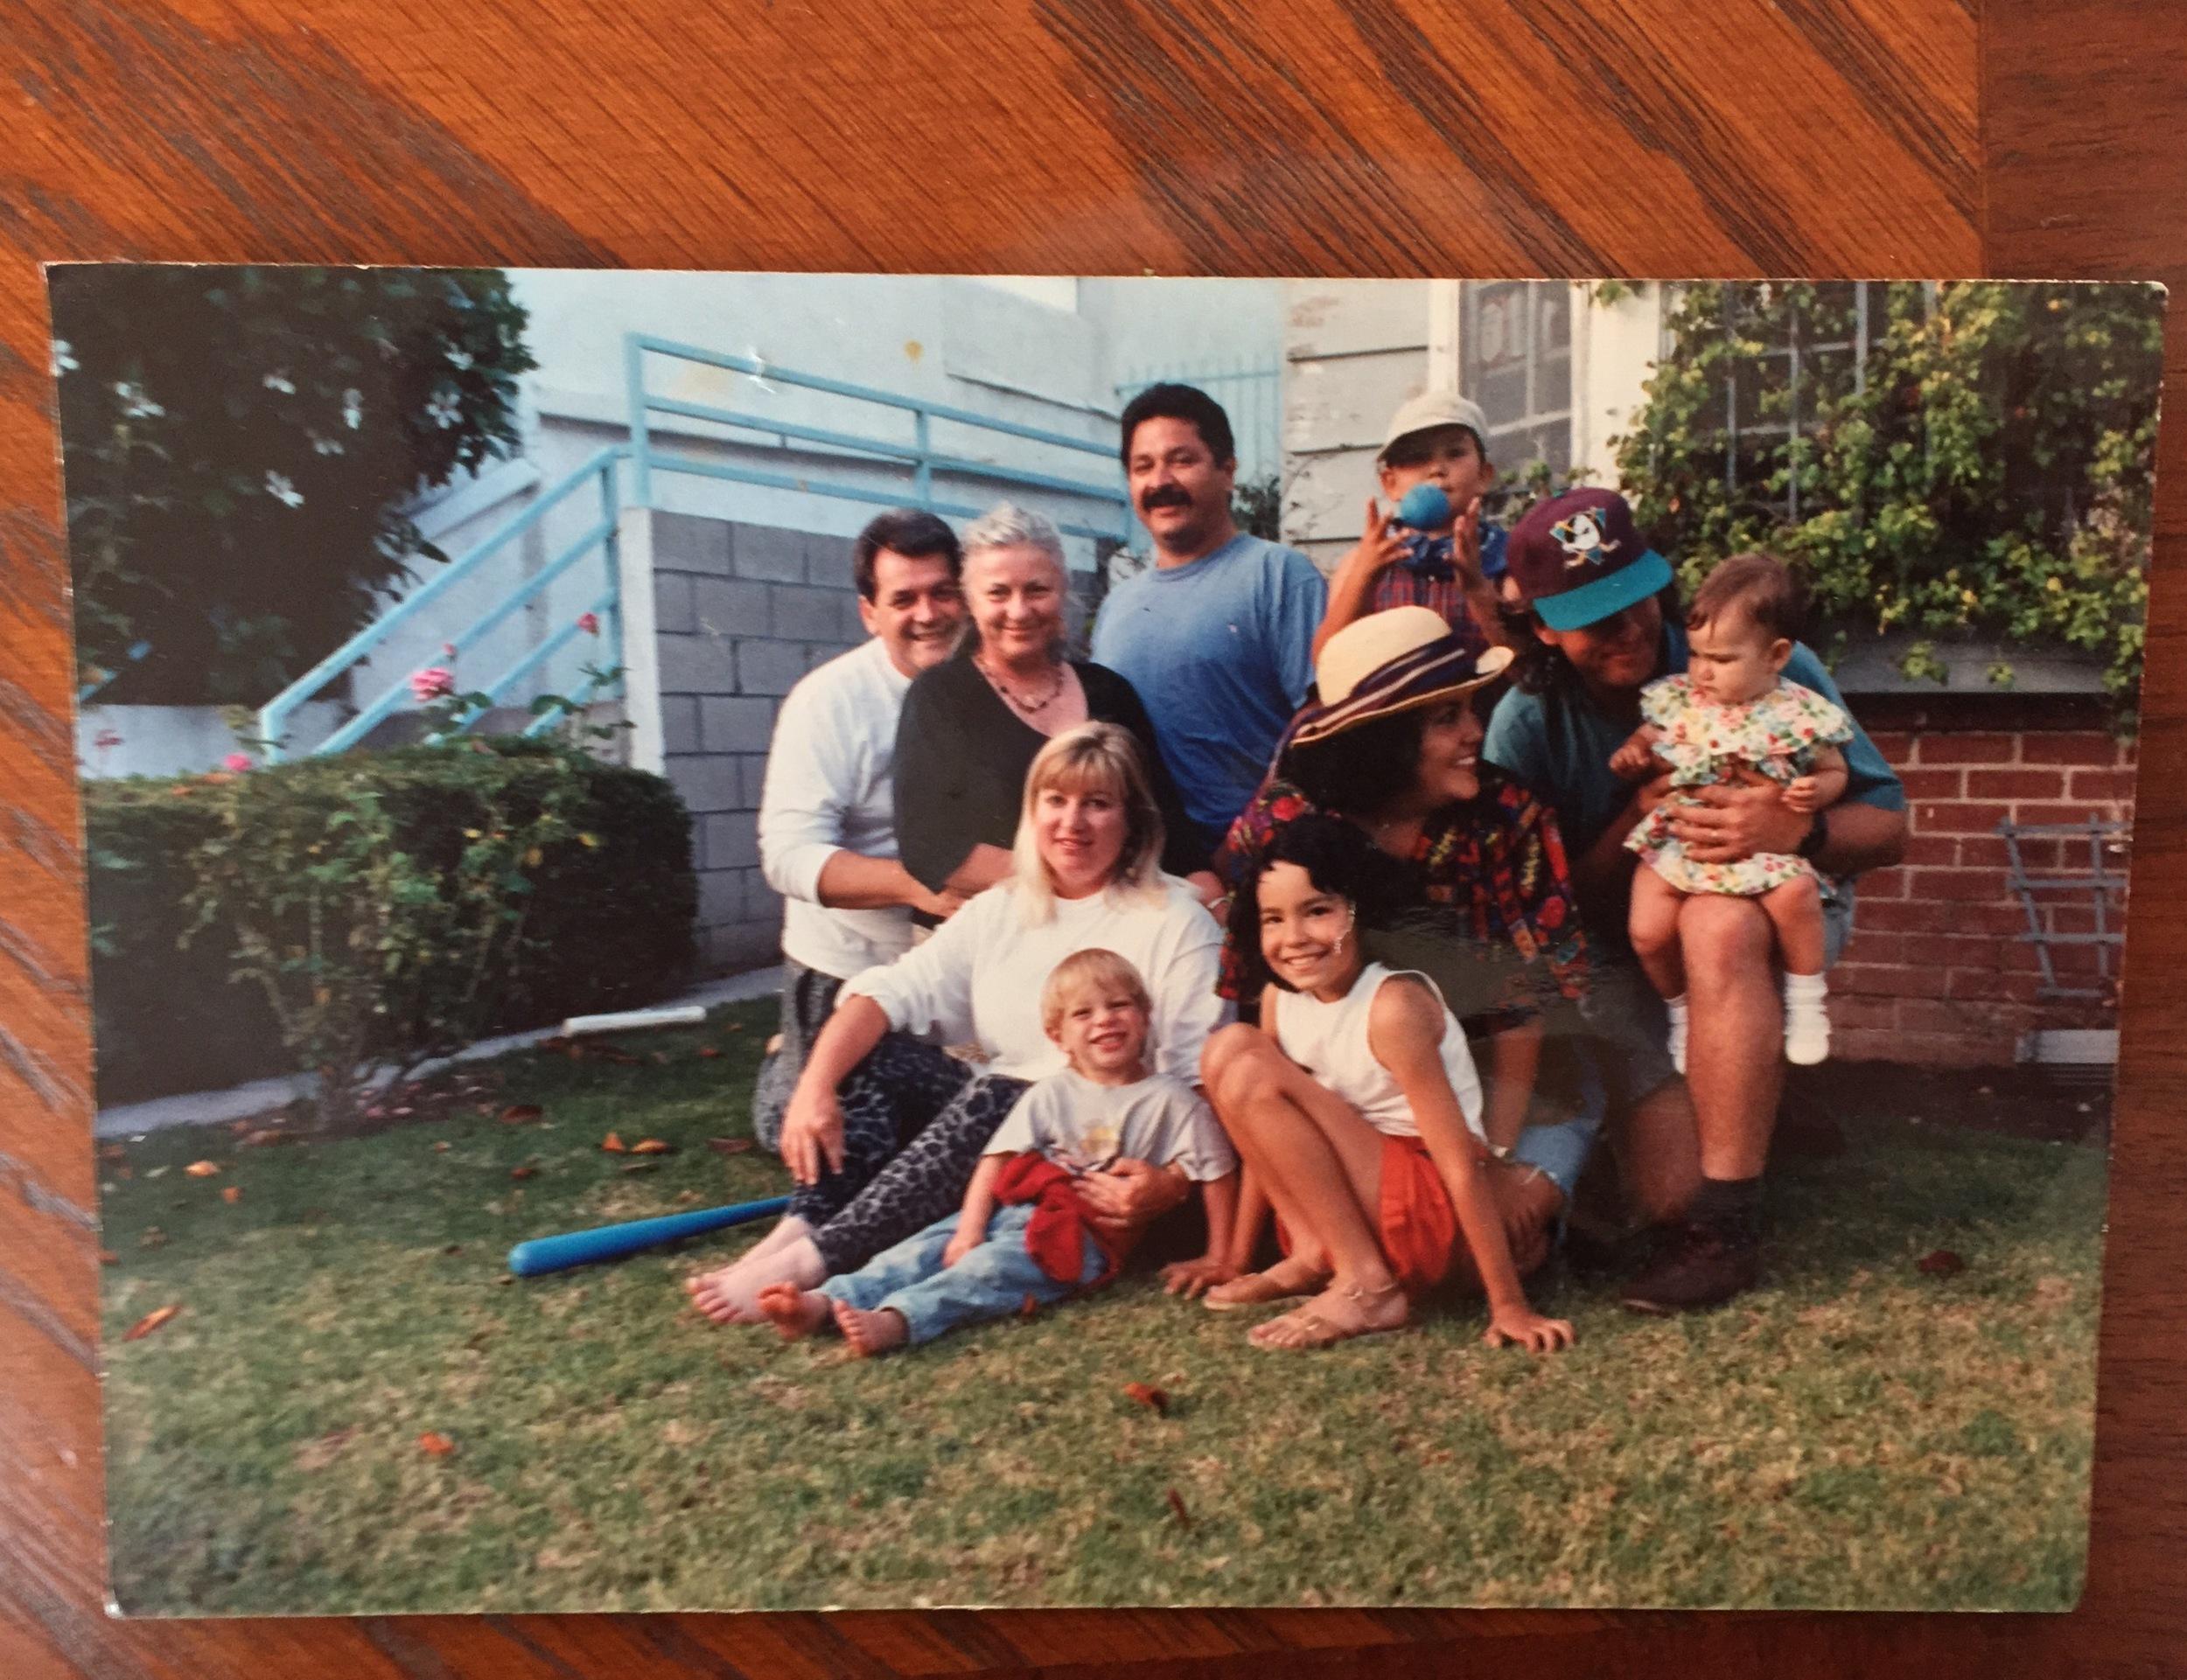 :: My family in Culver City, CA circa 1993 ::